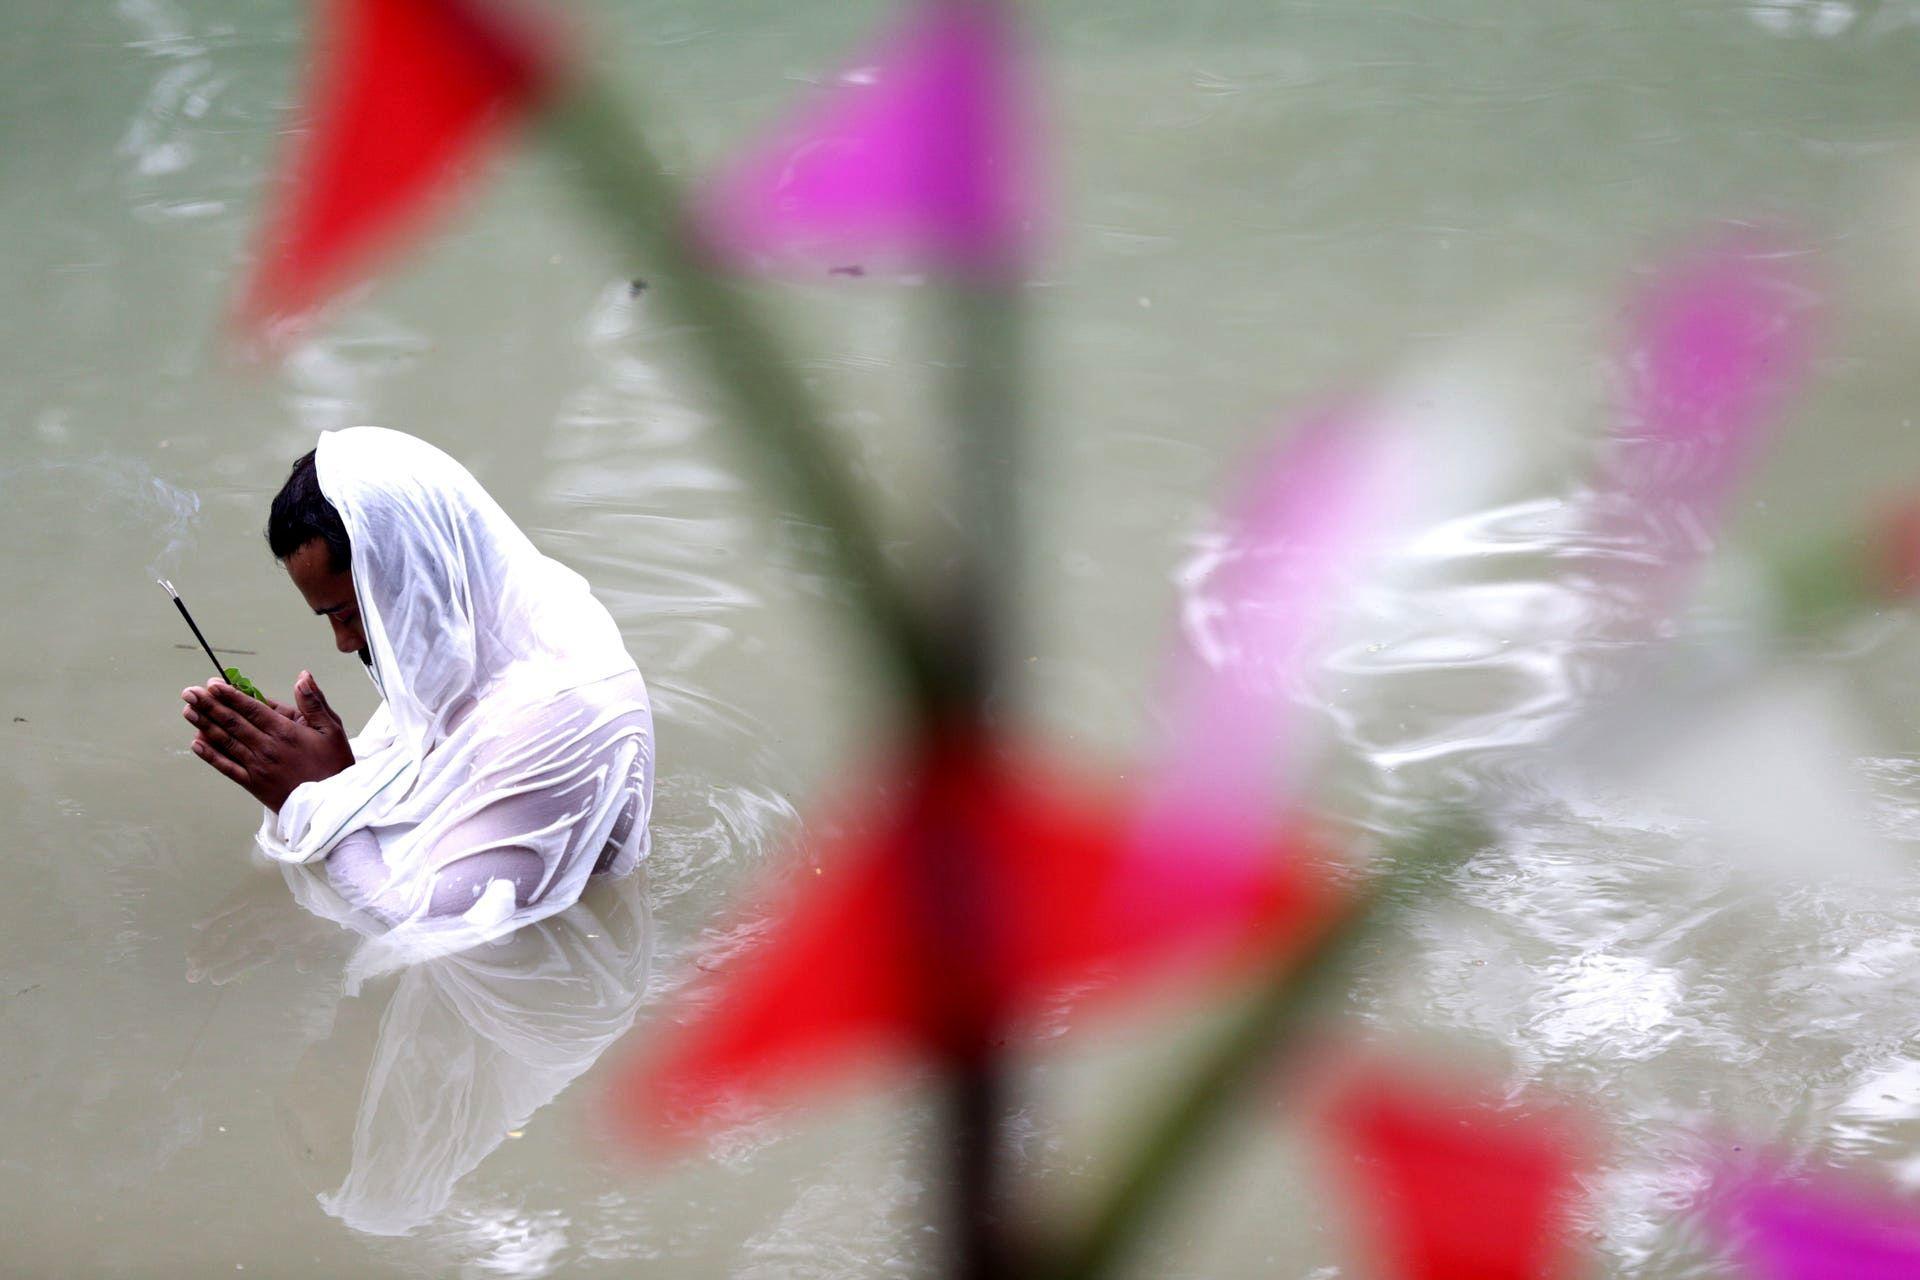 برترین تصاویر خبری ۲۴ ساعت گذشته/ 12 آبان